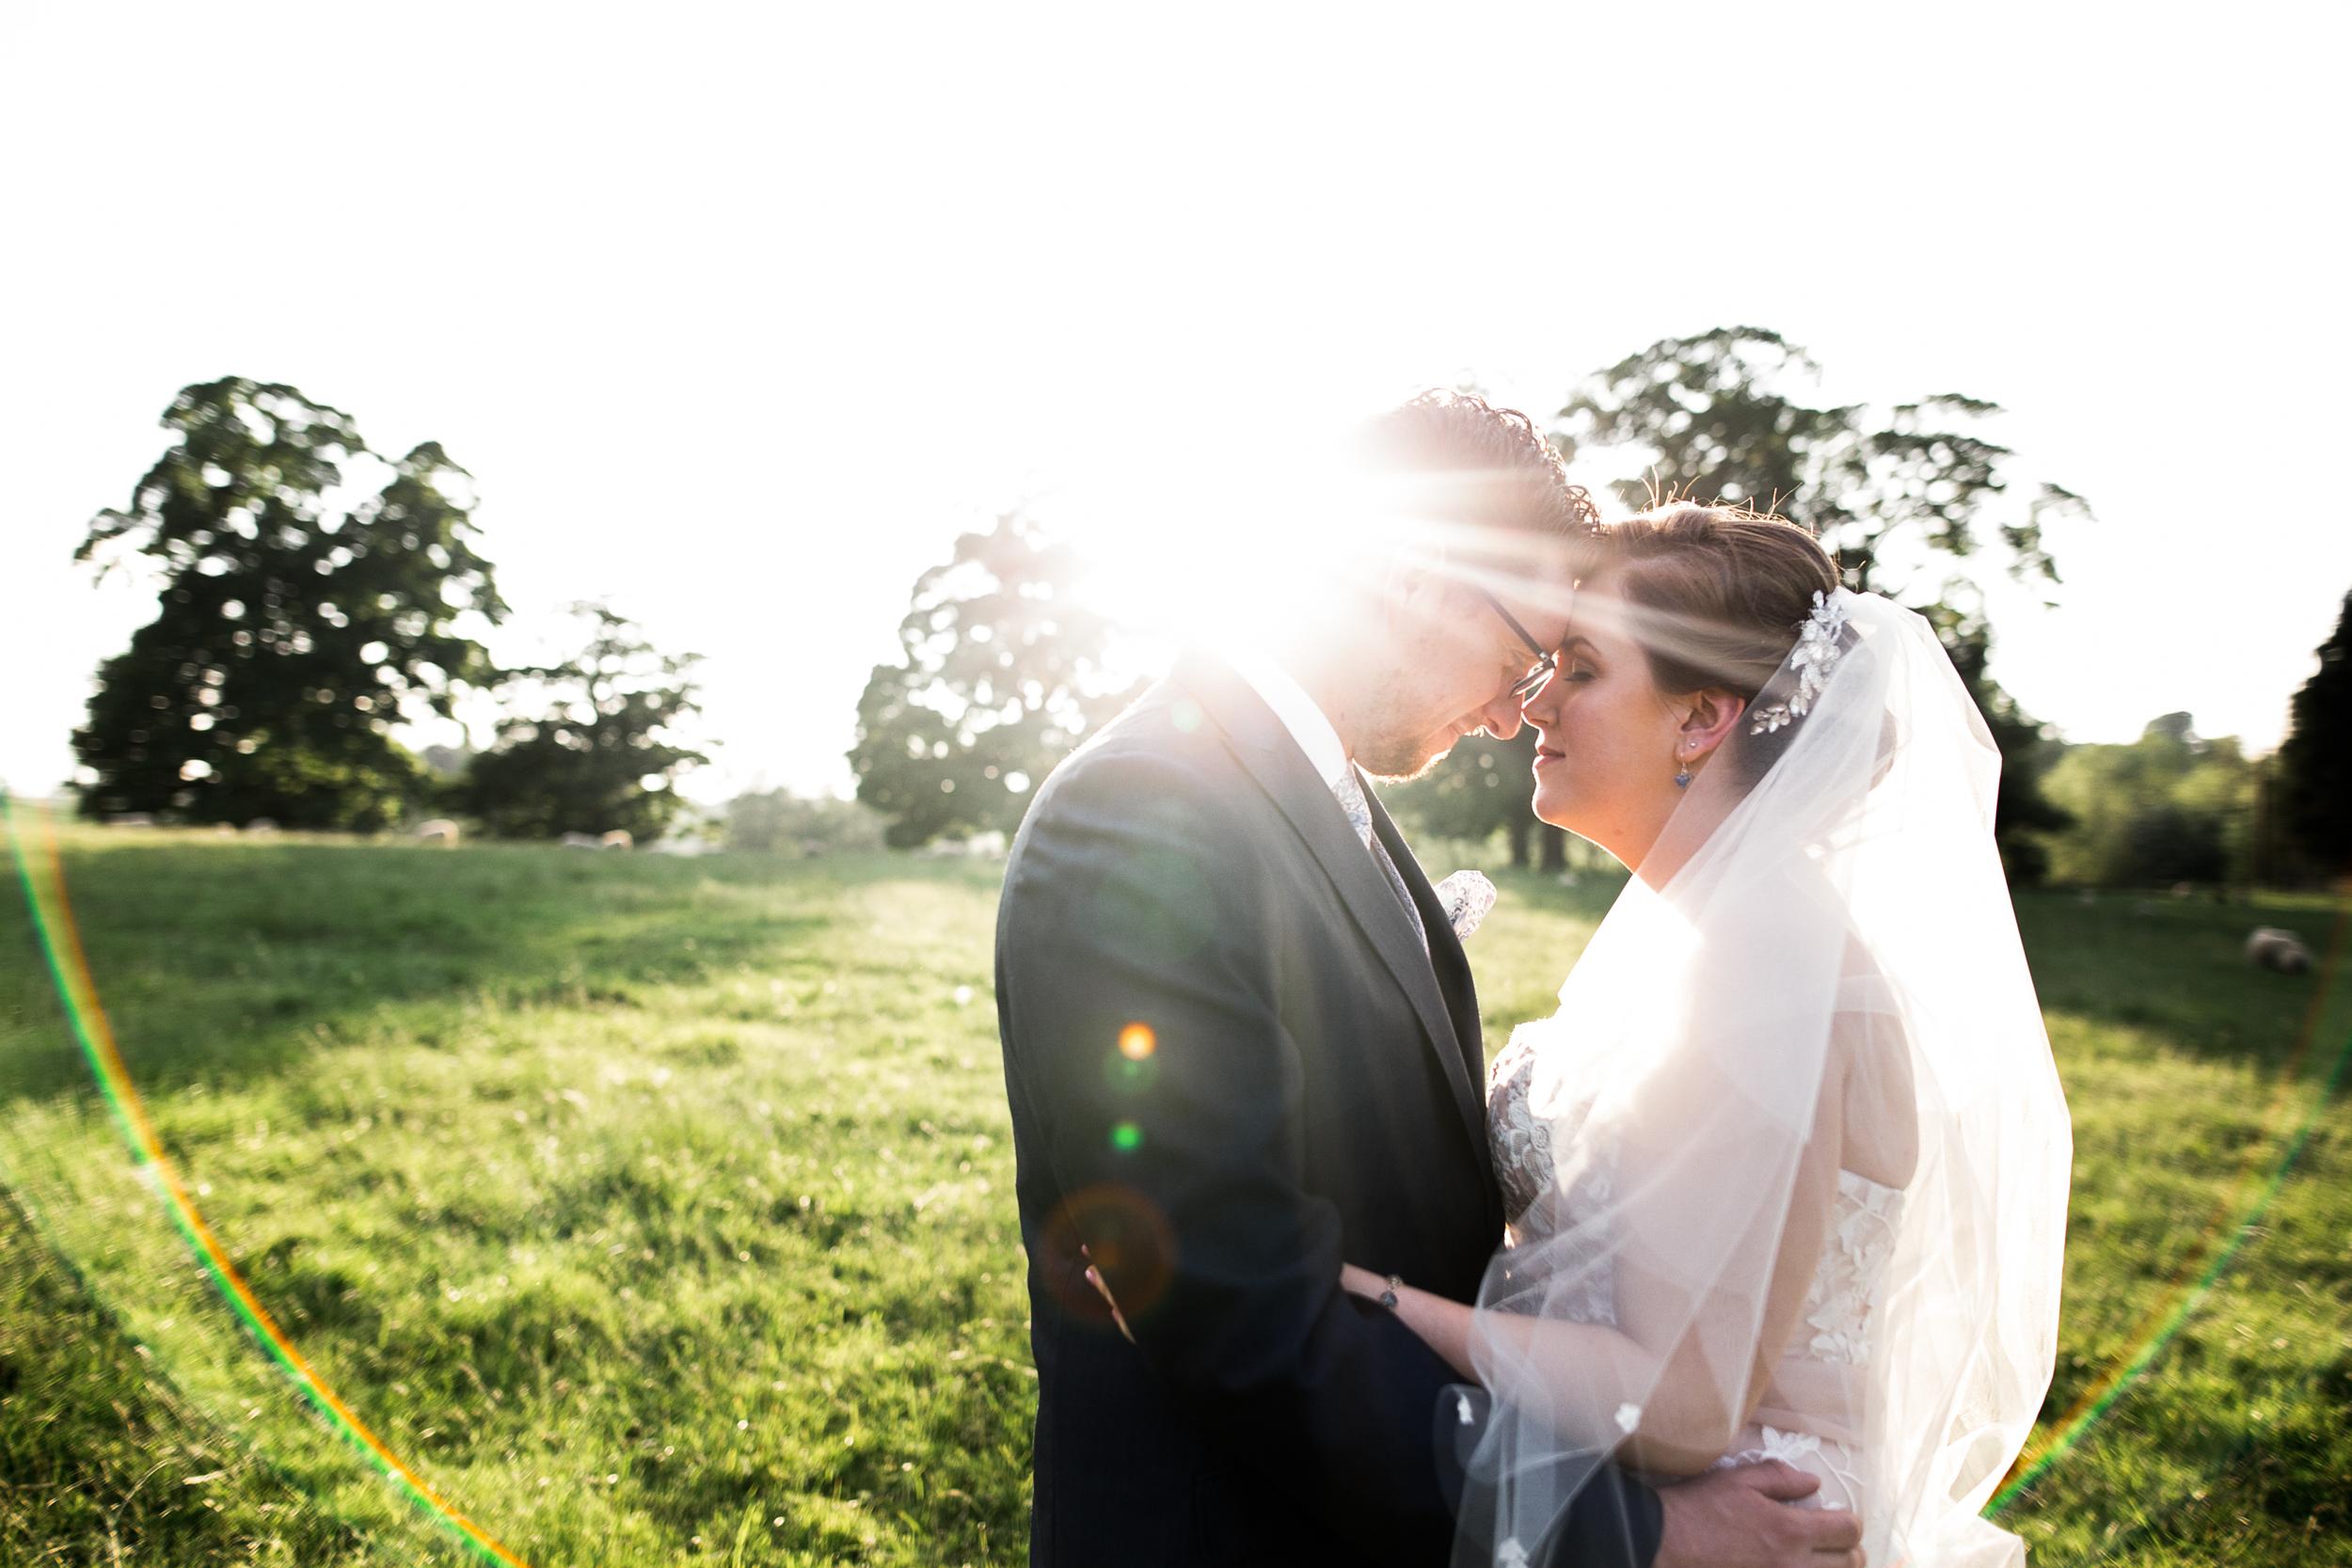 creative-wedding-photography-teesside-north-east-yorkshire-43.jpg